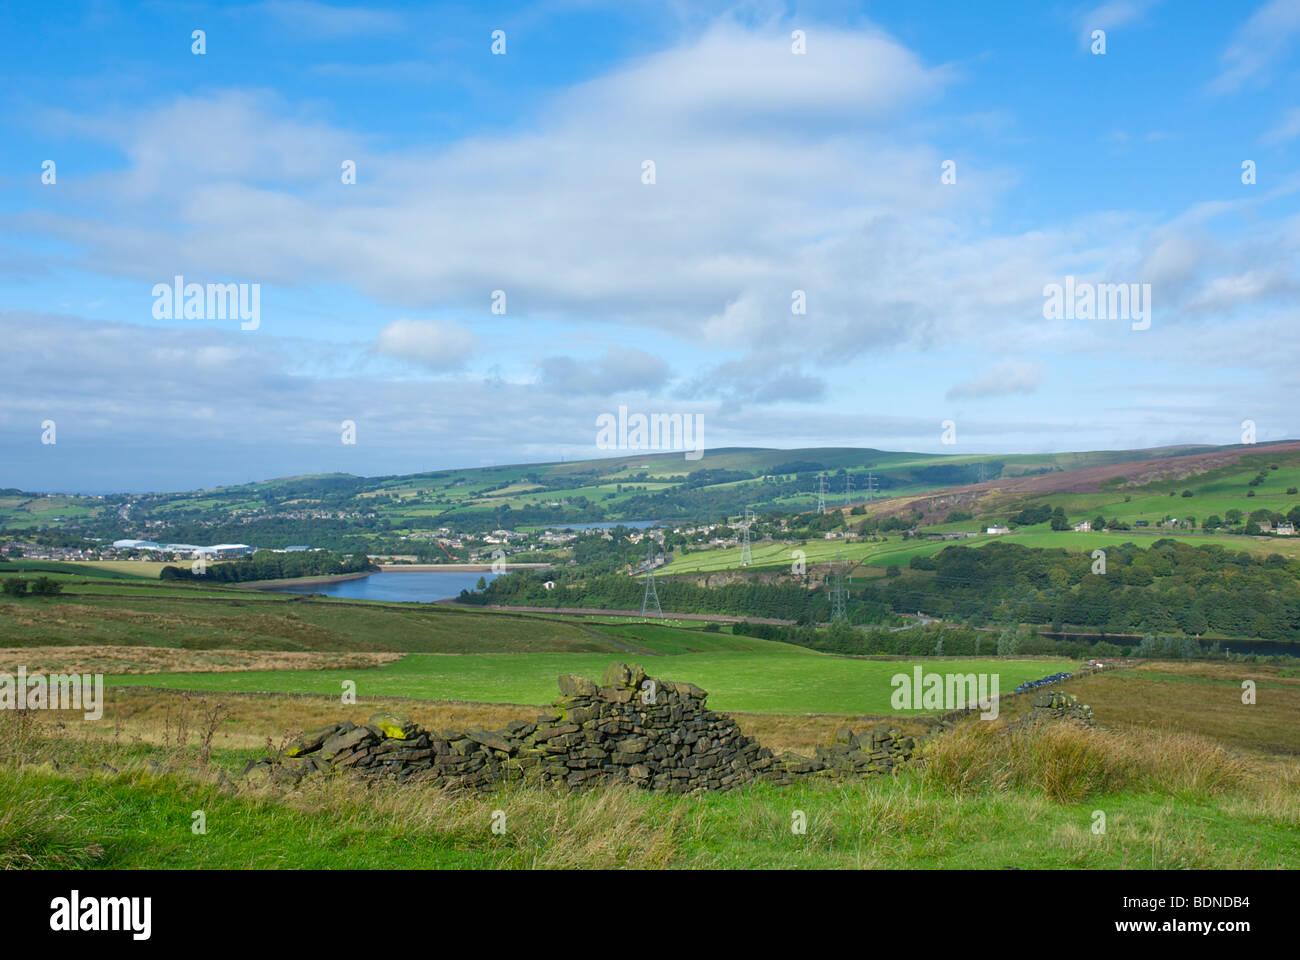 Tintwistle, Hadfield and Bottoms Reservoir, Longdendale, Peak National Park, Derbyshire, England UK - Stock Image